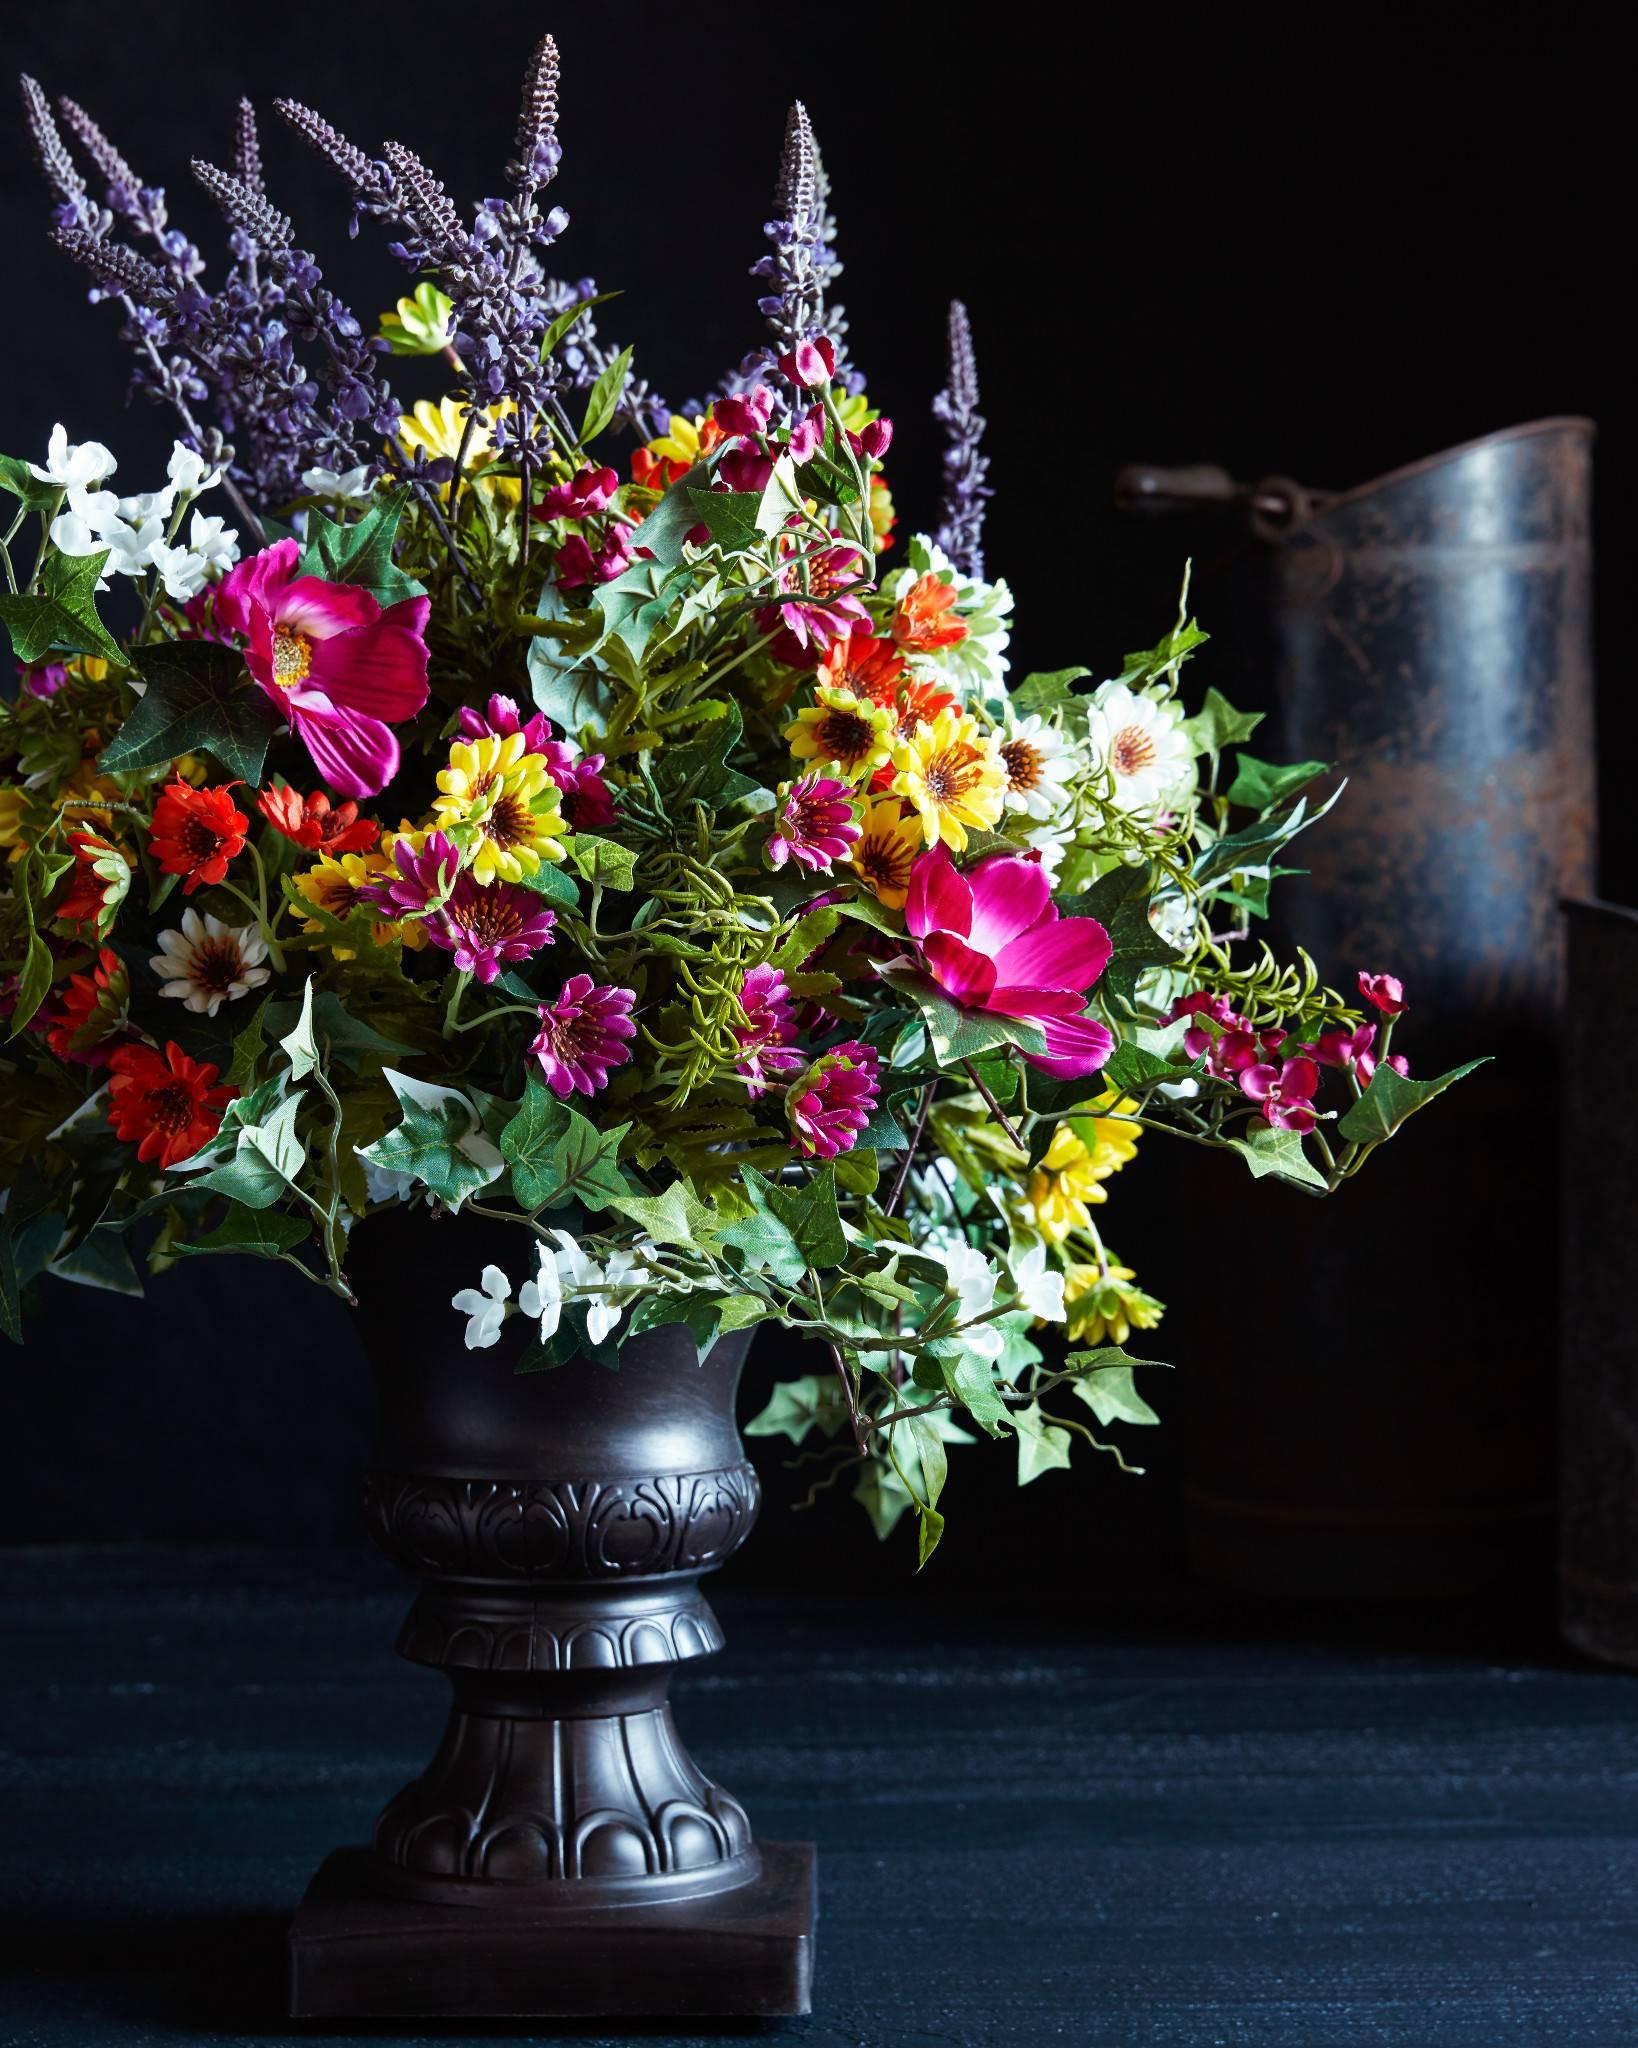 Florals Outdoor Safe Florals